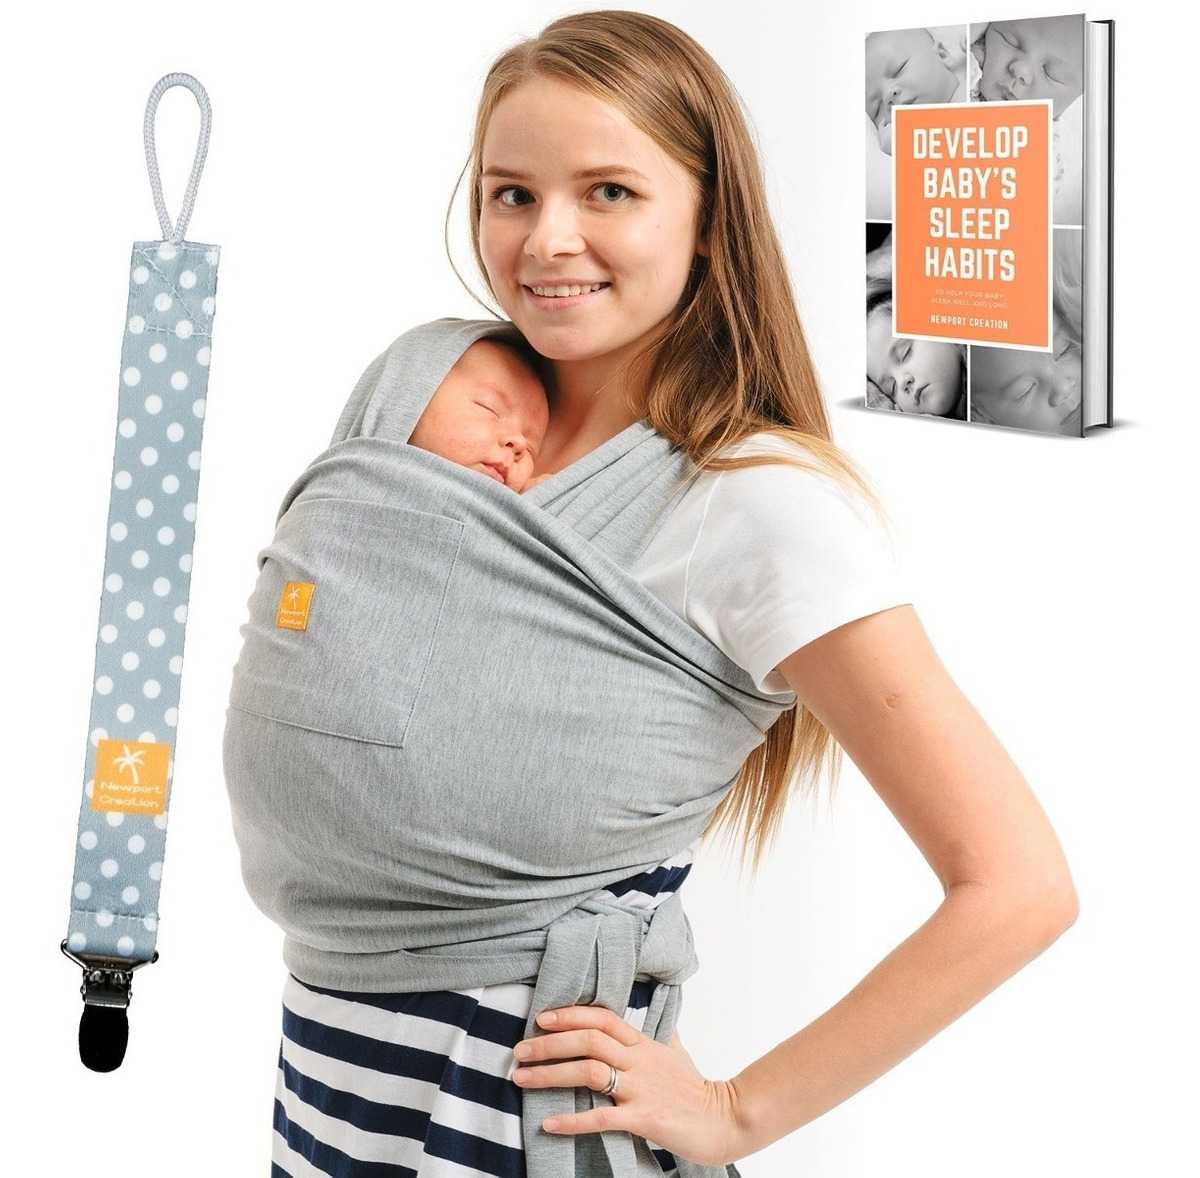 Paquetes Para Bebes Recien Nacidos.Baby Wrap Carrier 5 En 1 Paquete Para Bebes Recien Nacidos